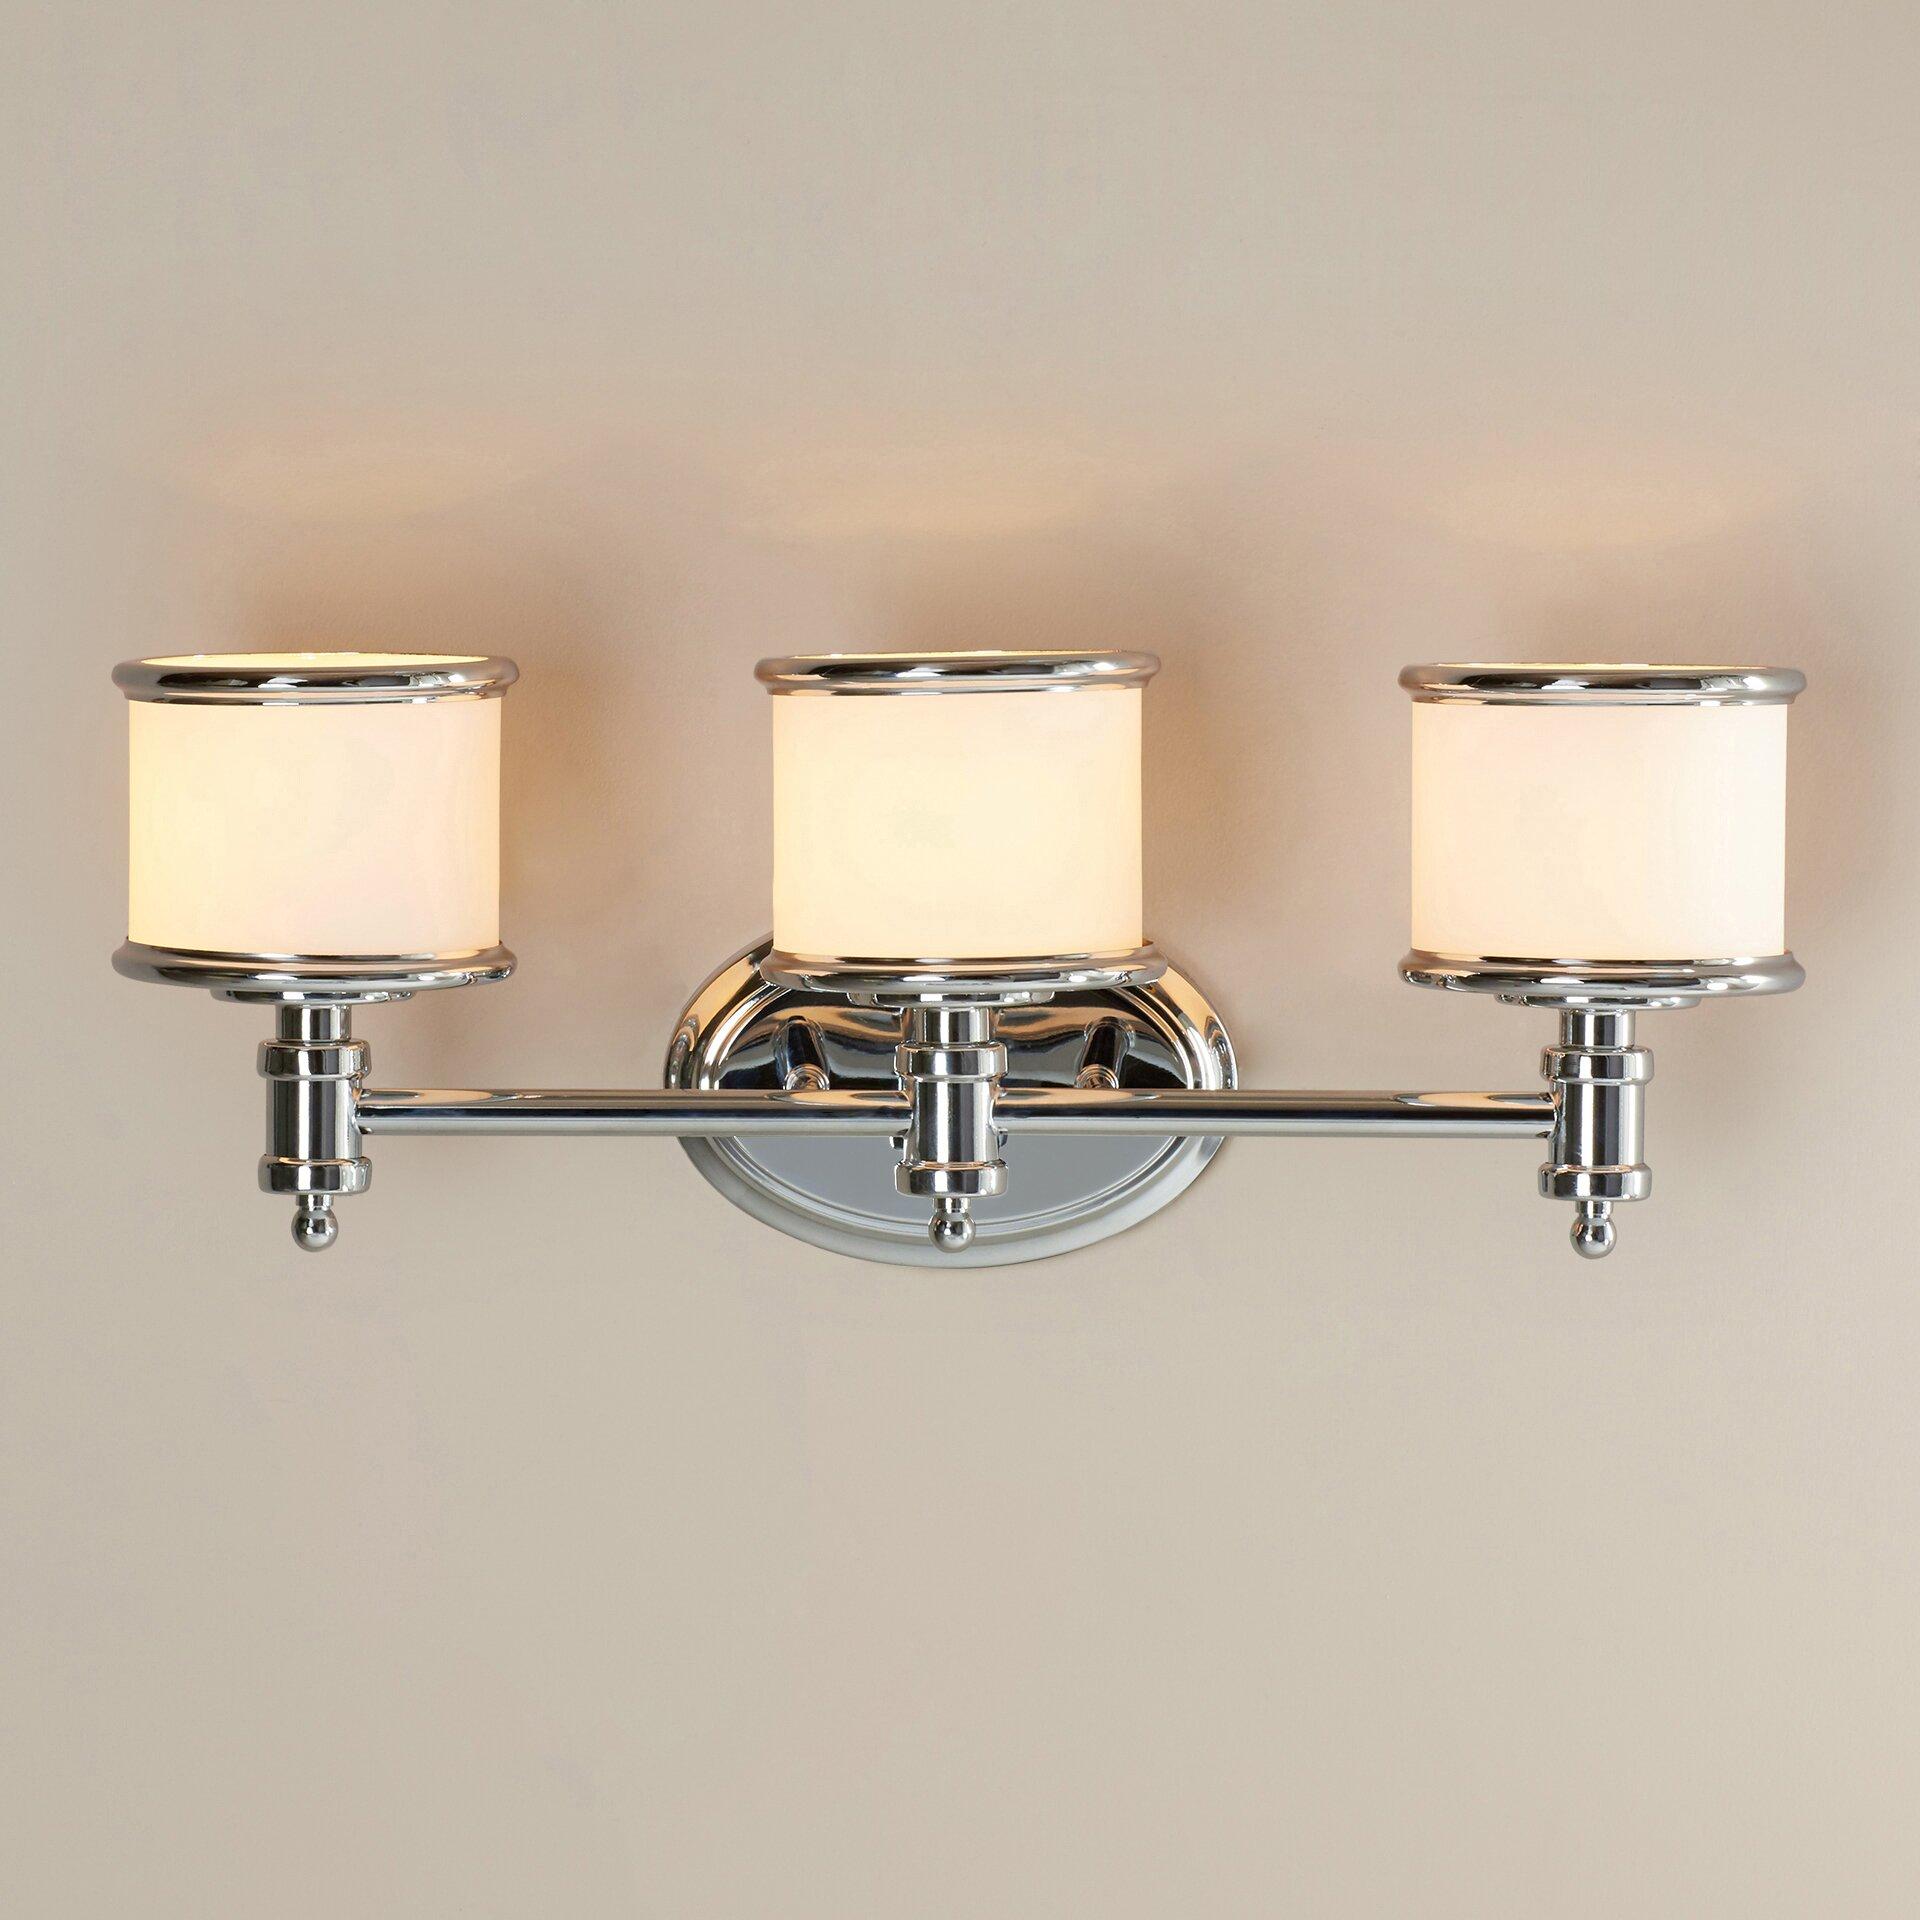 Darby Home Co Bogan 3 Light Vanity Light Amp Reviews Wayfair